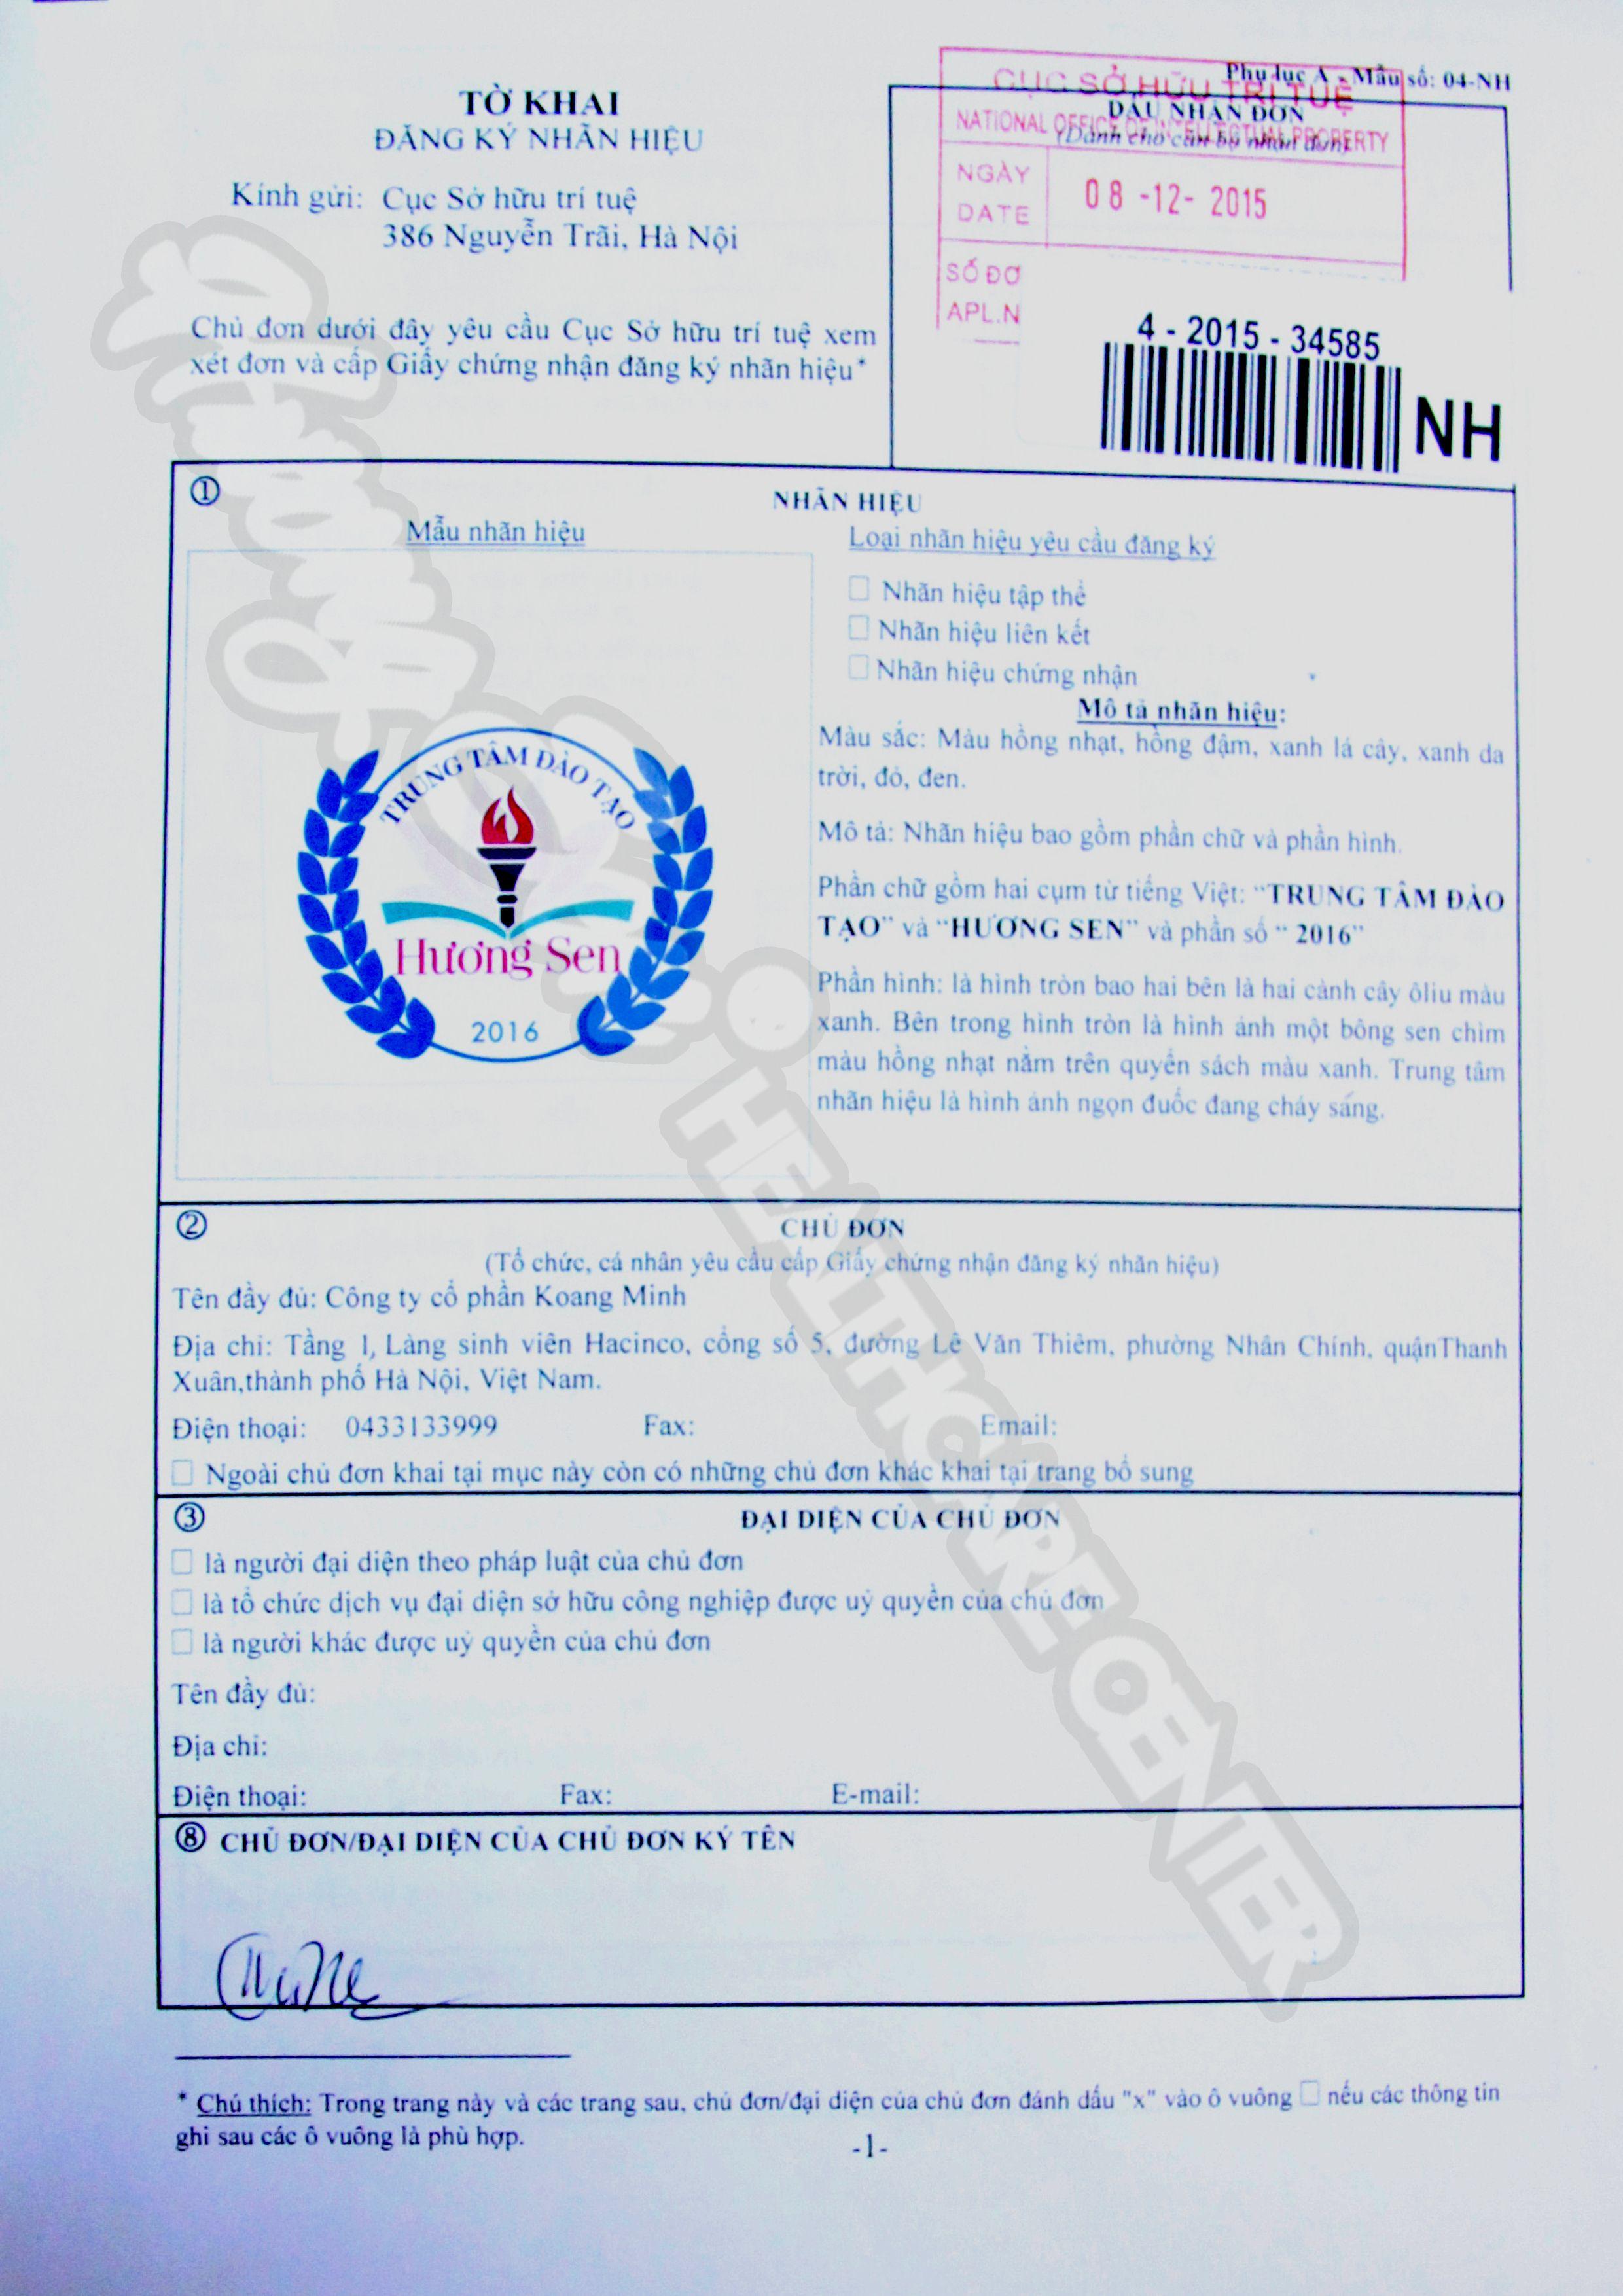 trademark-registration-certificate-huong-sen-academy